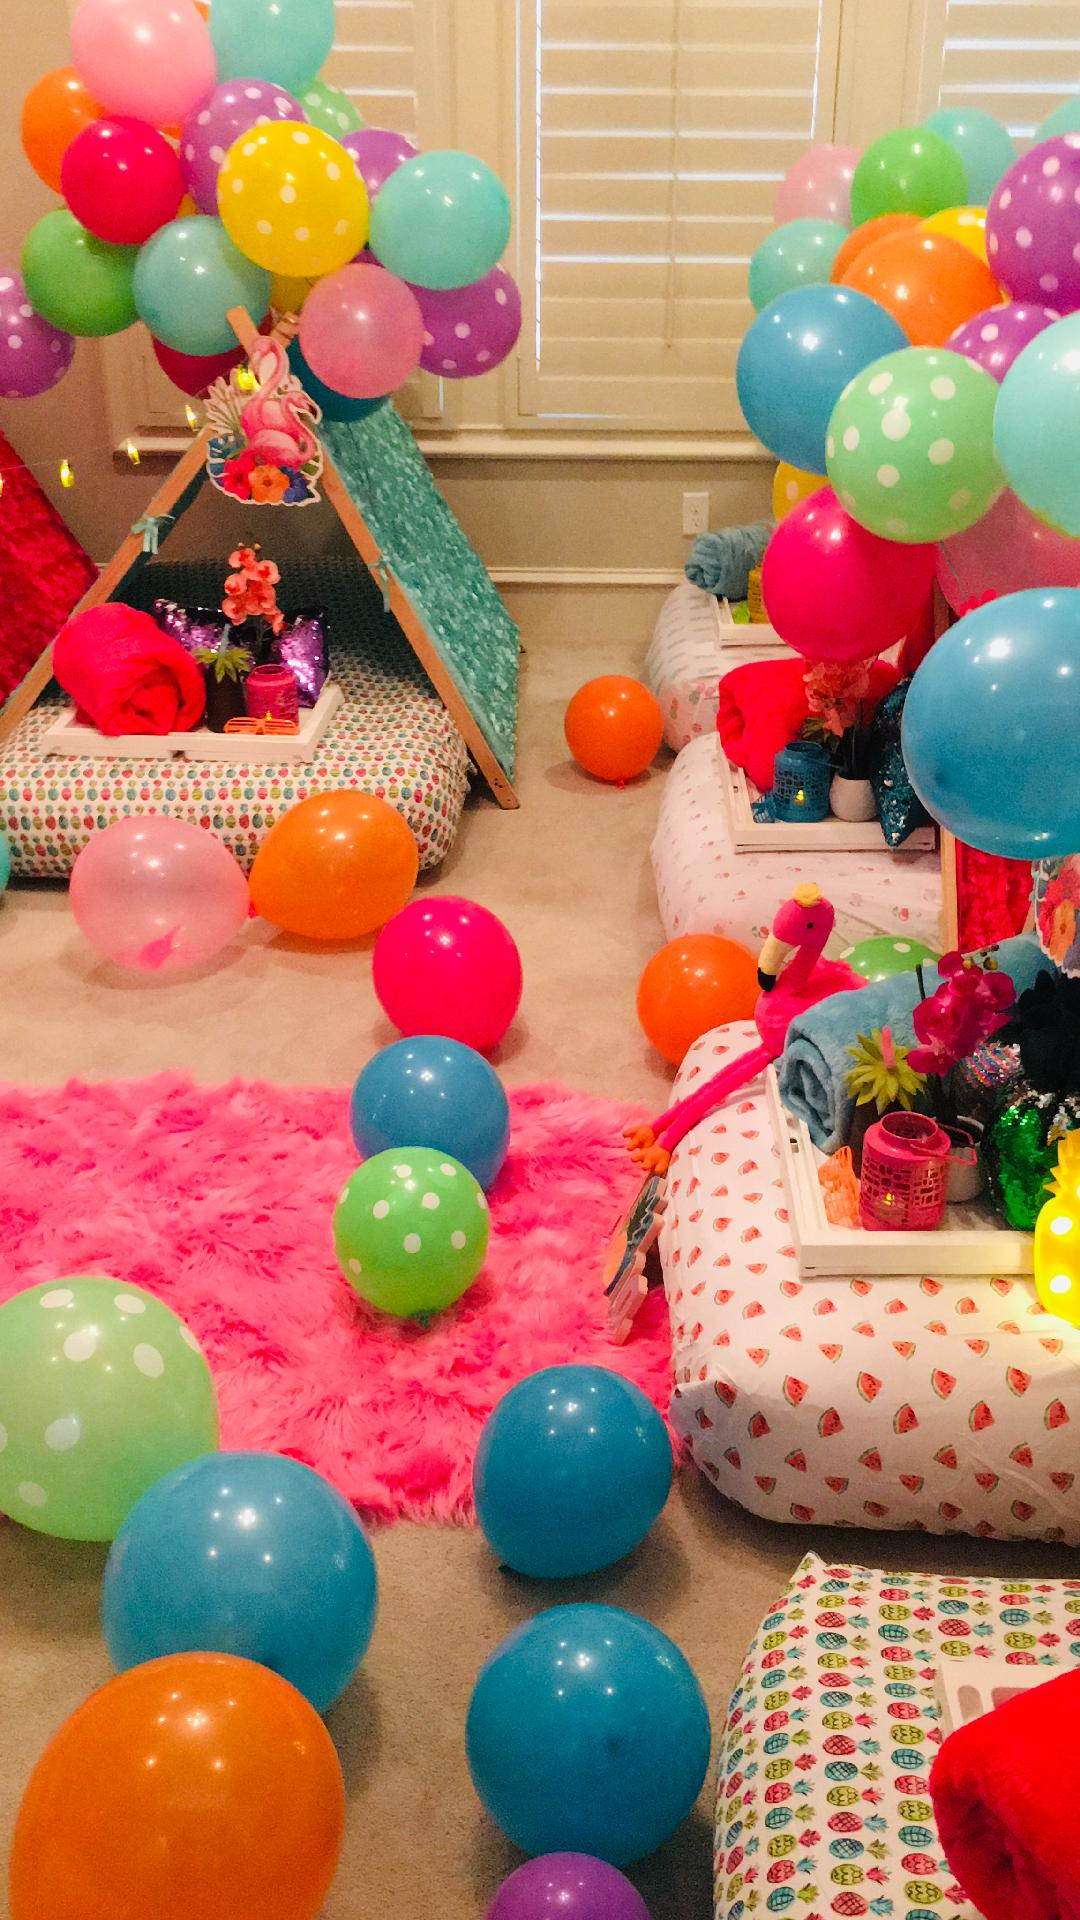 houston kids birthday teepee party tent rentals 6.jpg